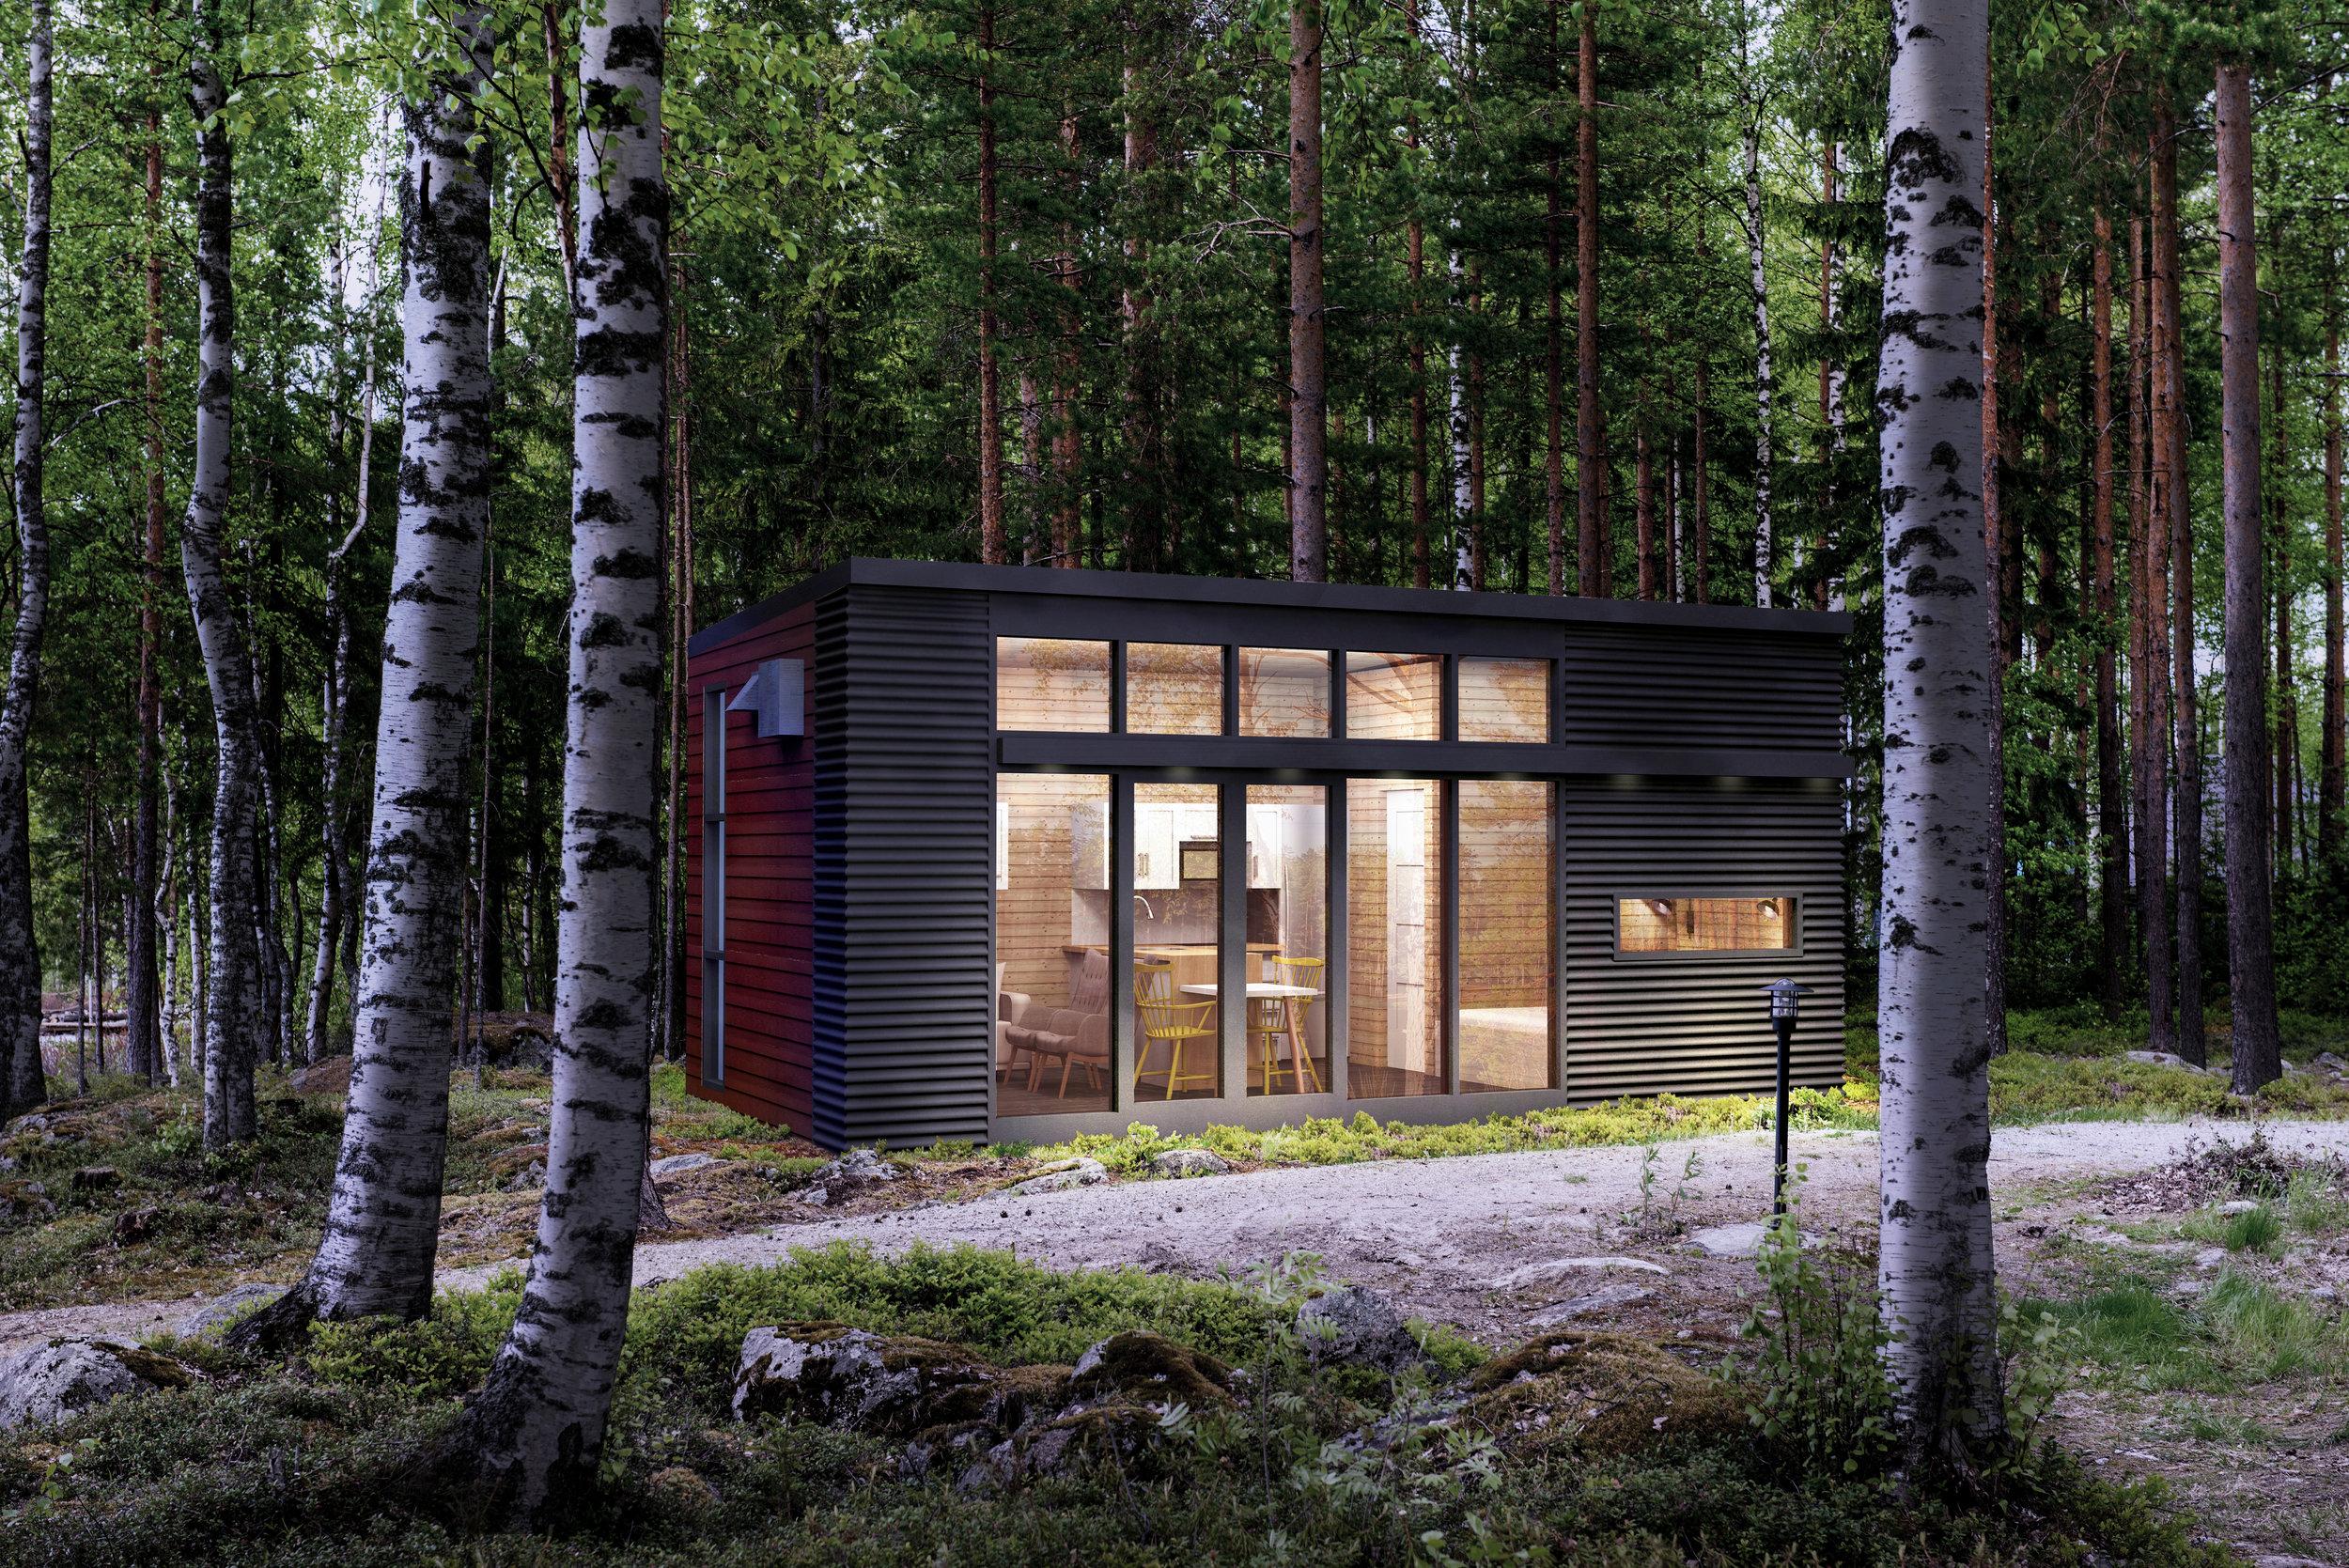 Ilo Mini Maison